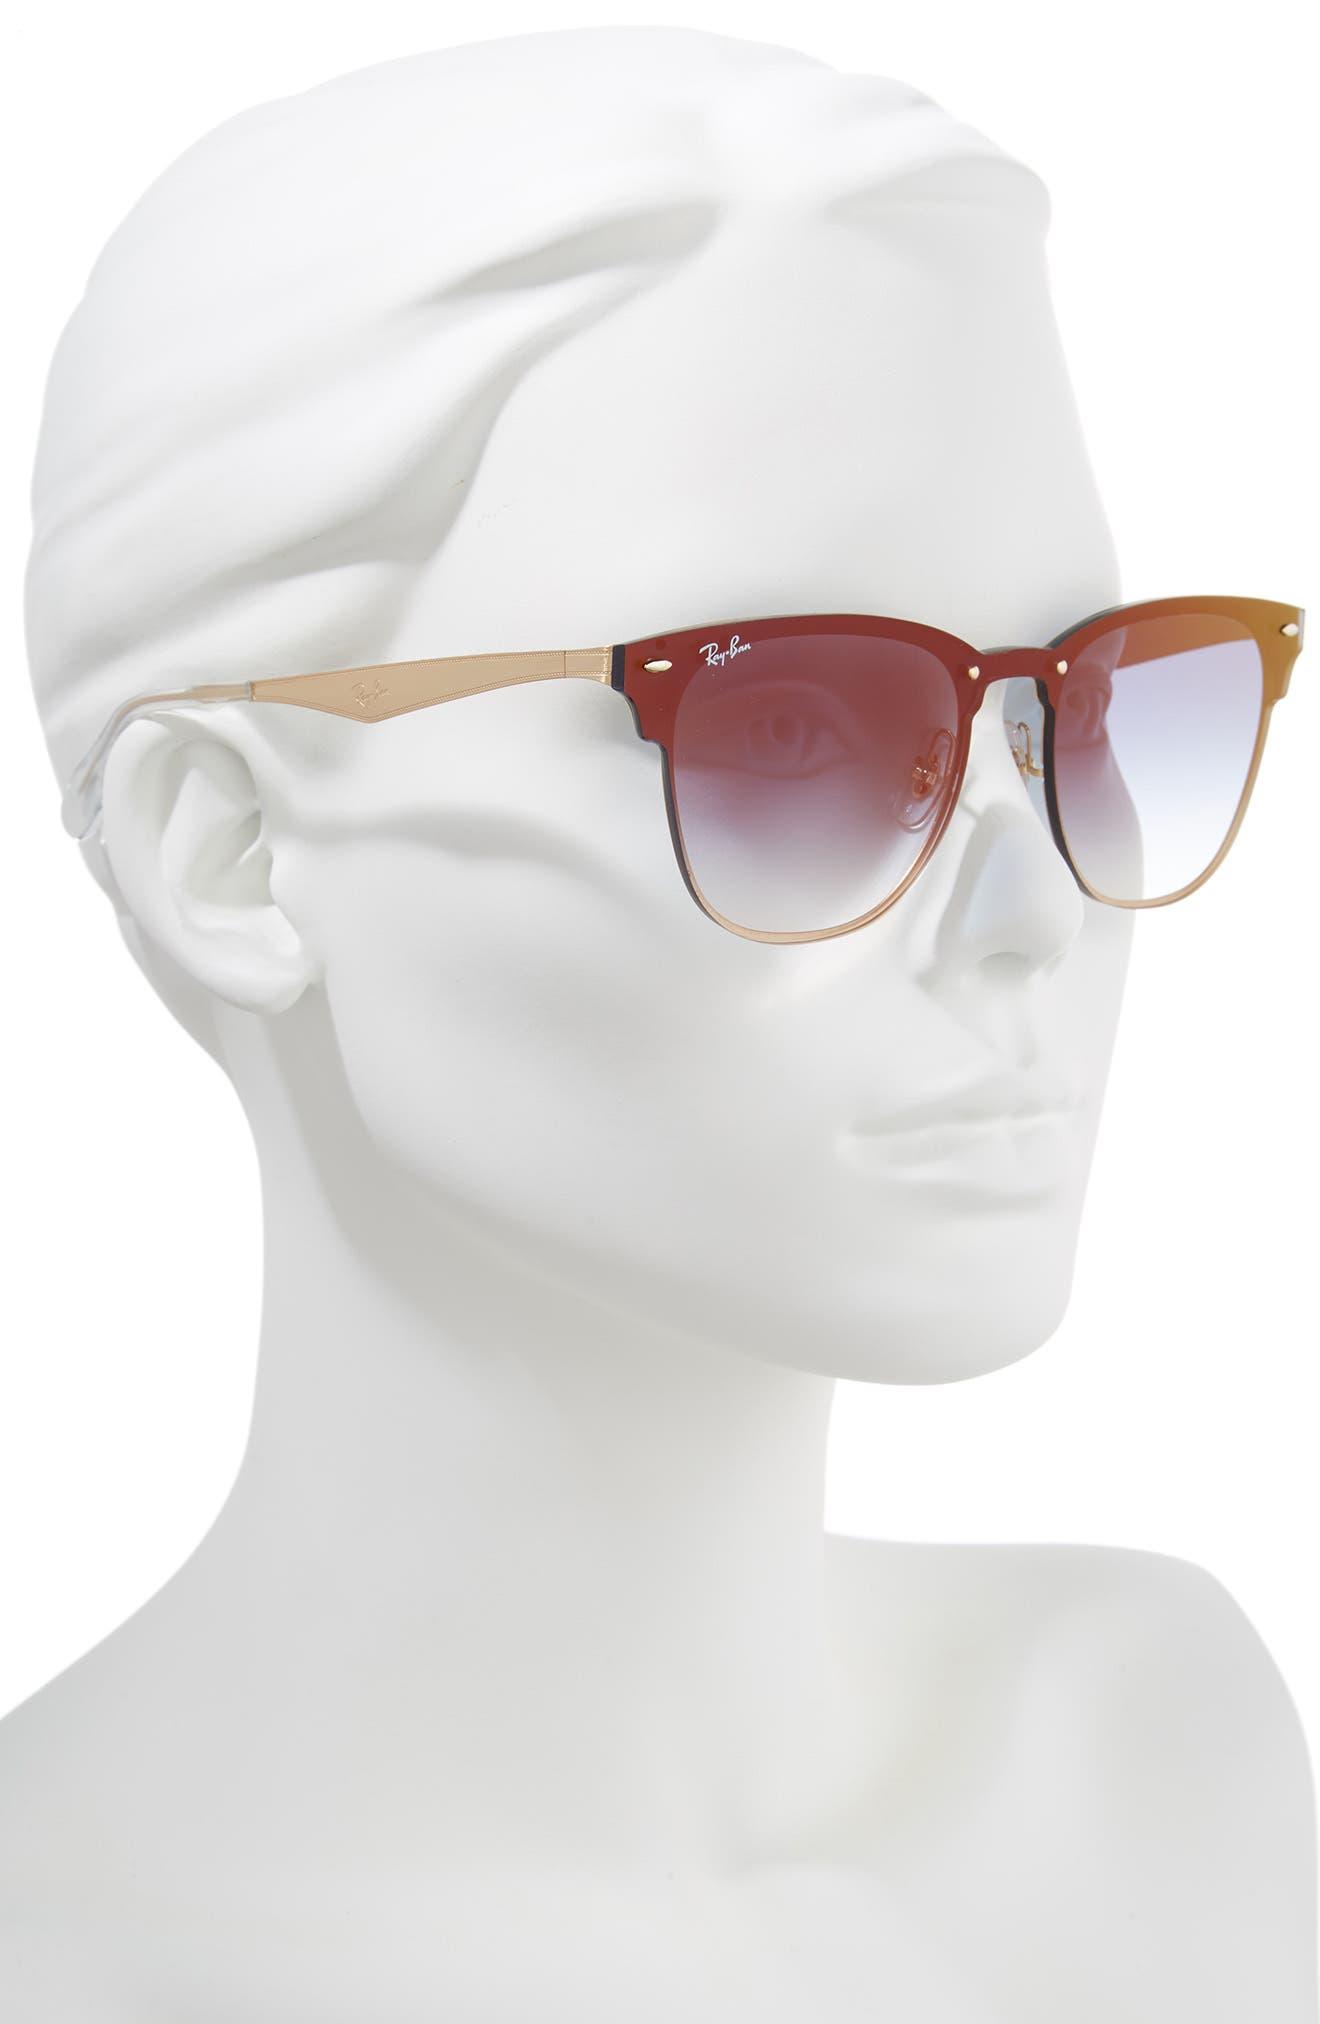 Blaze Clubmaster 47mm Sunglasses,                             Alternate thumbnail 2, color,                             Gold